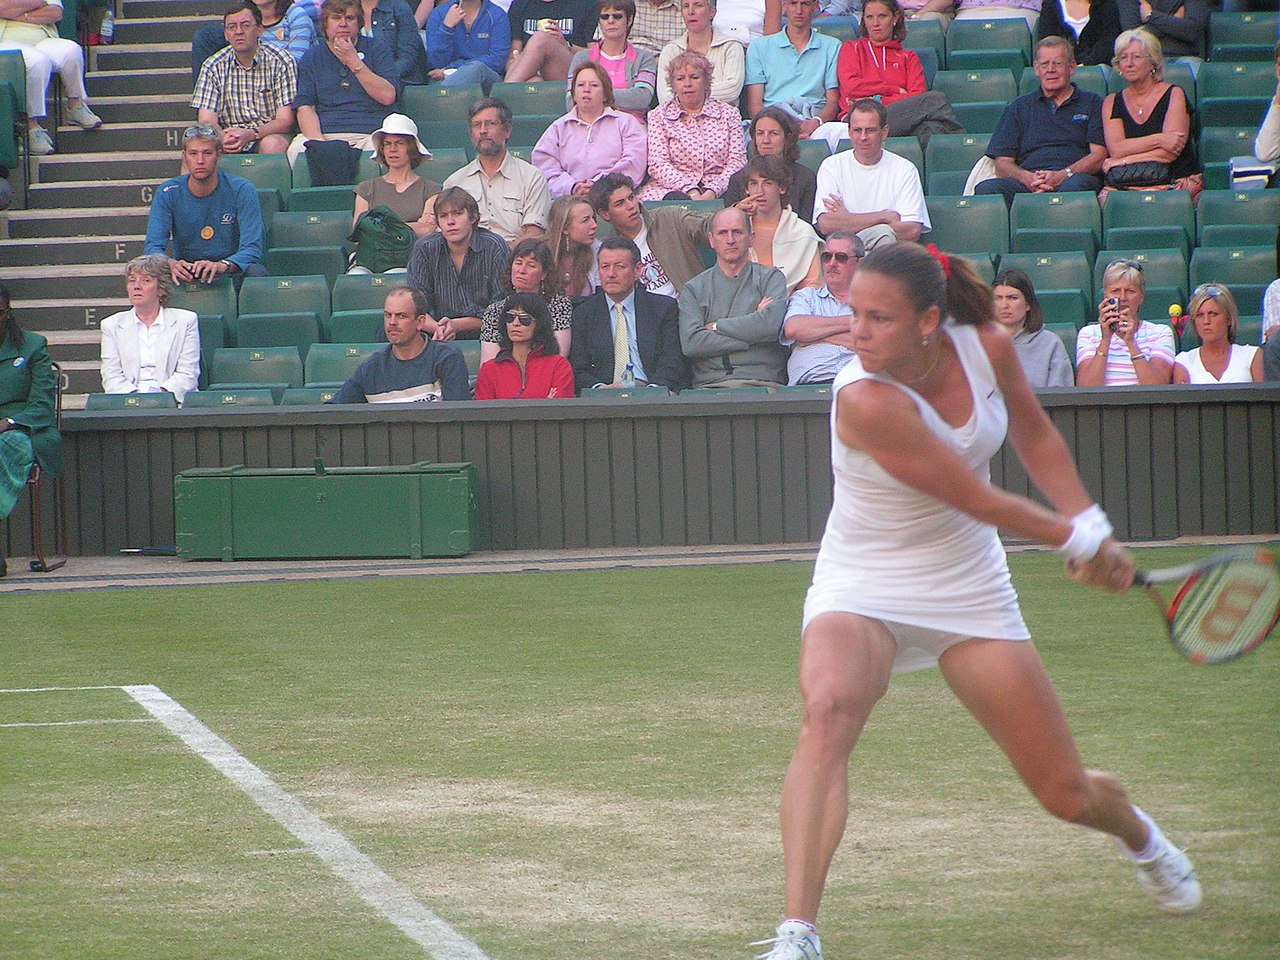 File Lindsay Davenport backhand Wimbledon 2004 Wikimedia mons